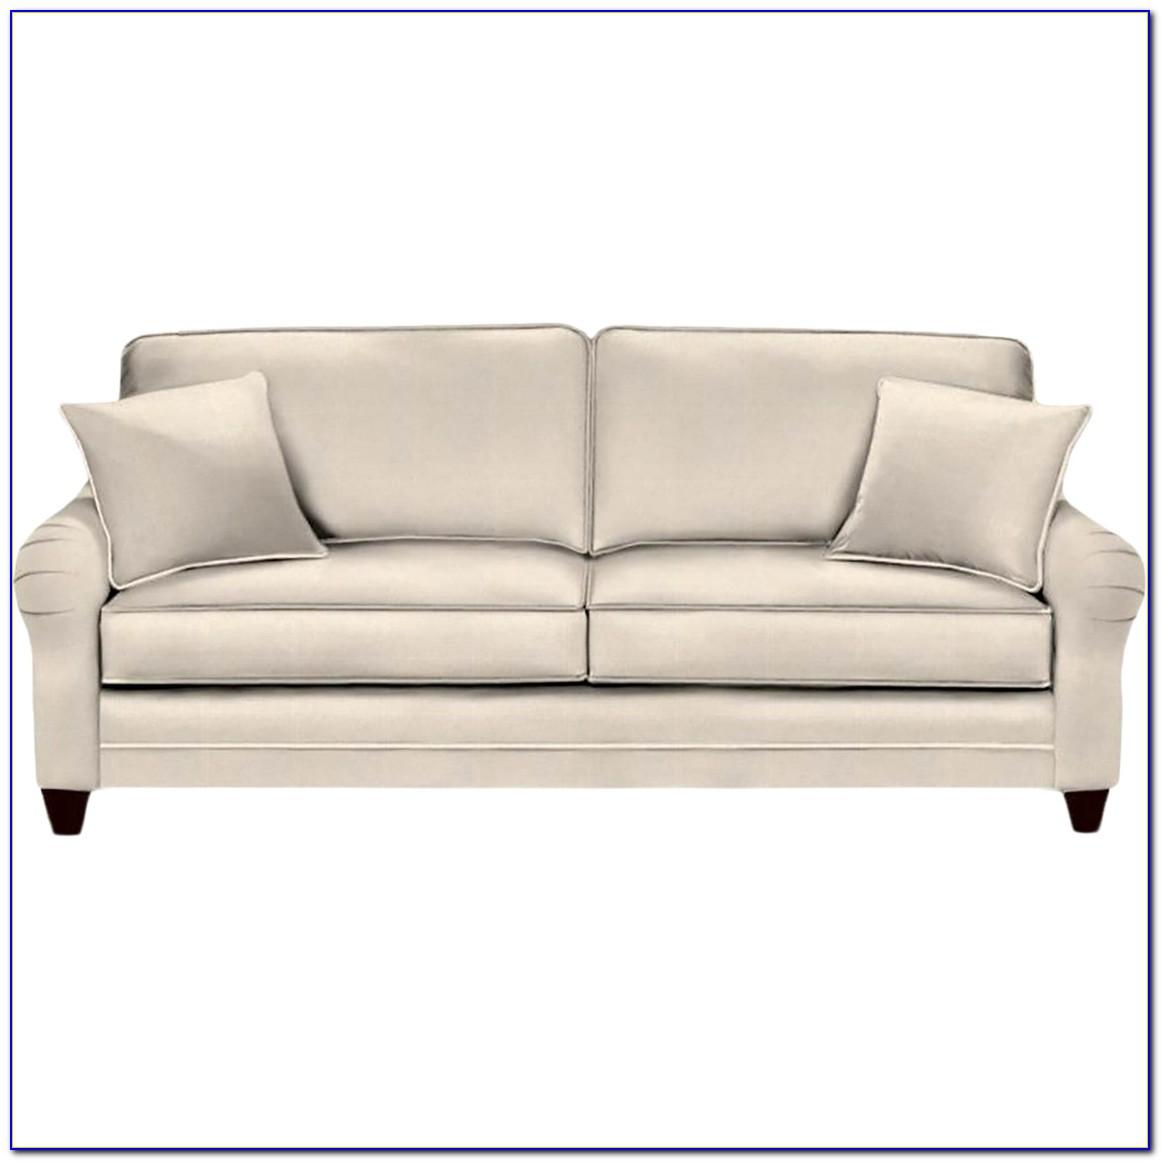 Bassett Charles Of London Sofa